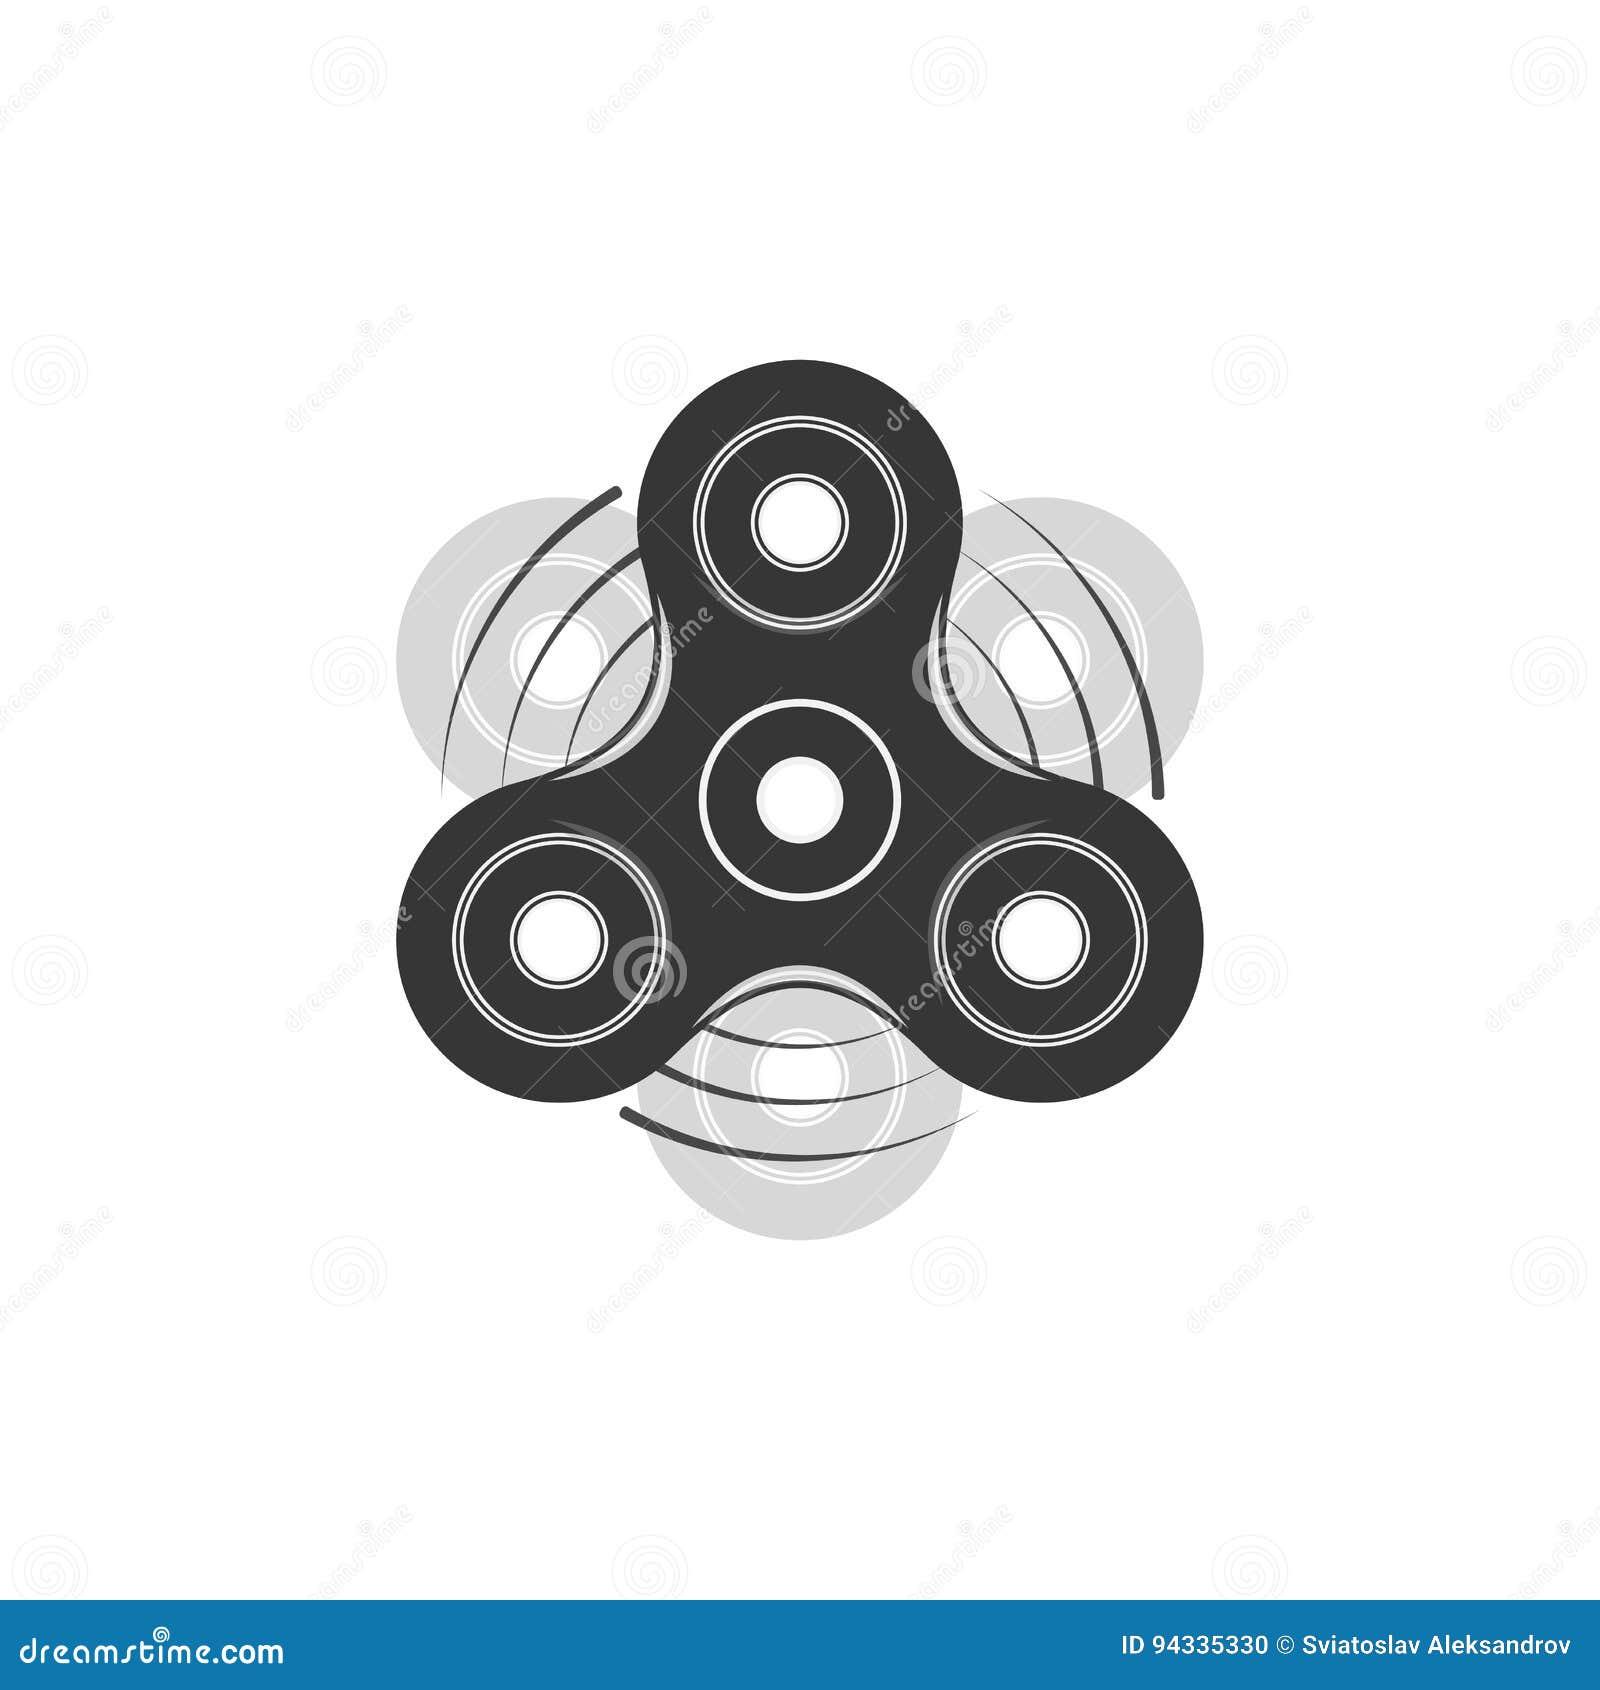 fidget spinner graphic element template stock vector illustration